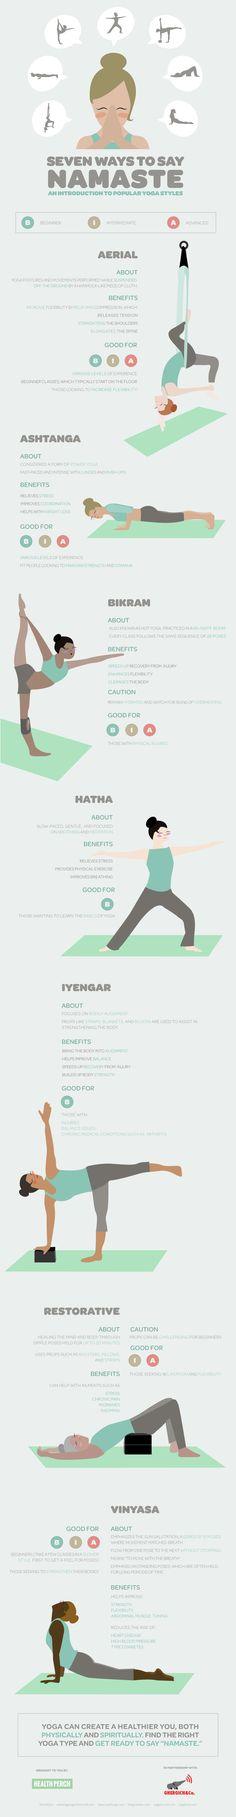 Vinyasa yoga celebrity fitness trainers